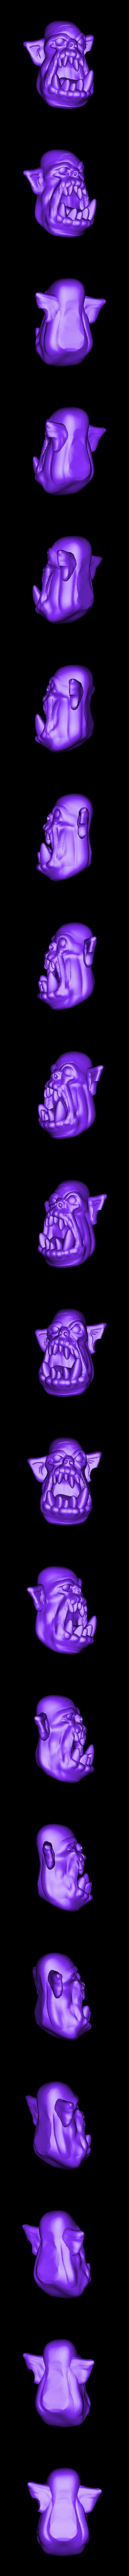 Ork_Head_1.stl Download free STL file Miniature - Ork Heads (Heroic Scale) (2016) • 3D printing object, whackolantern